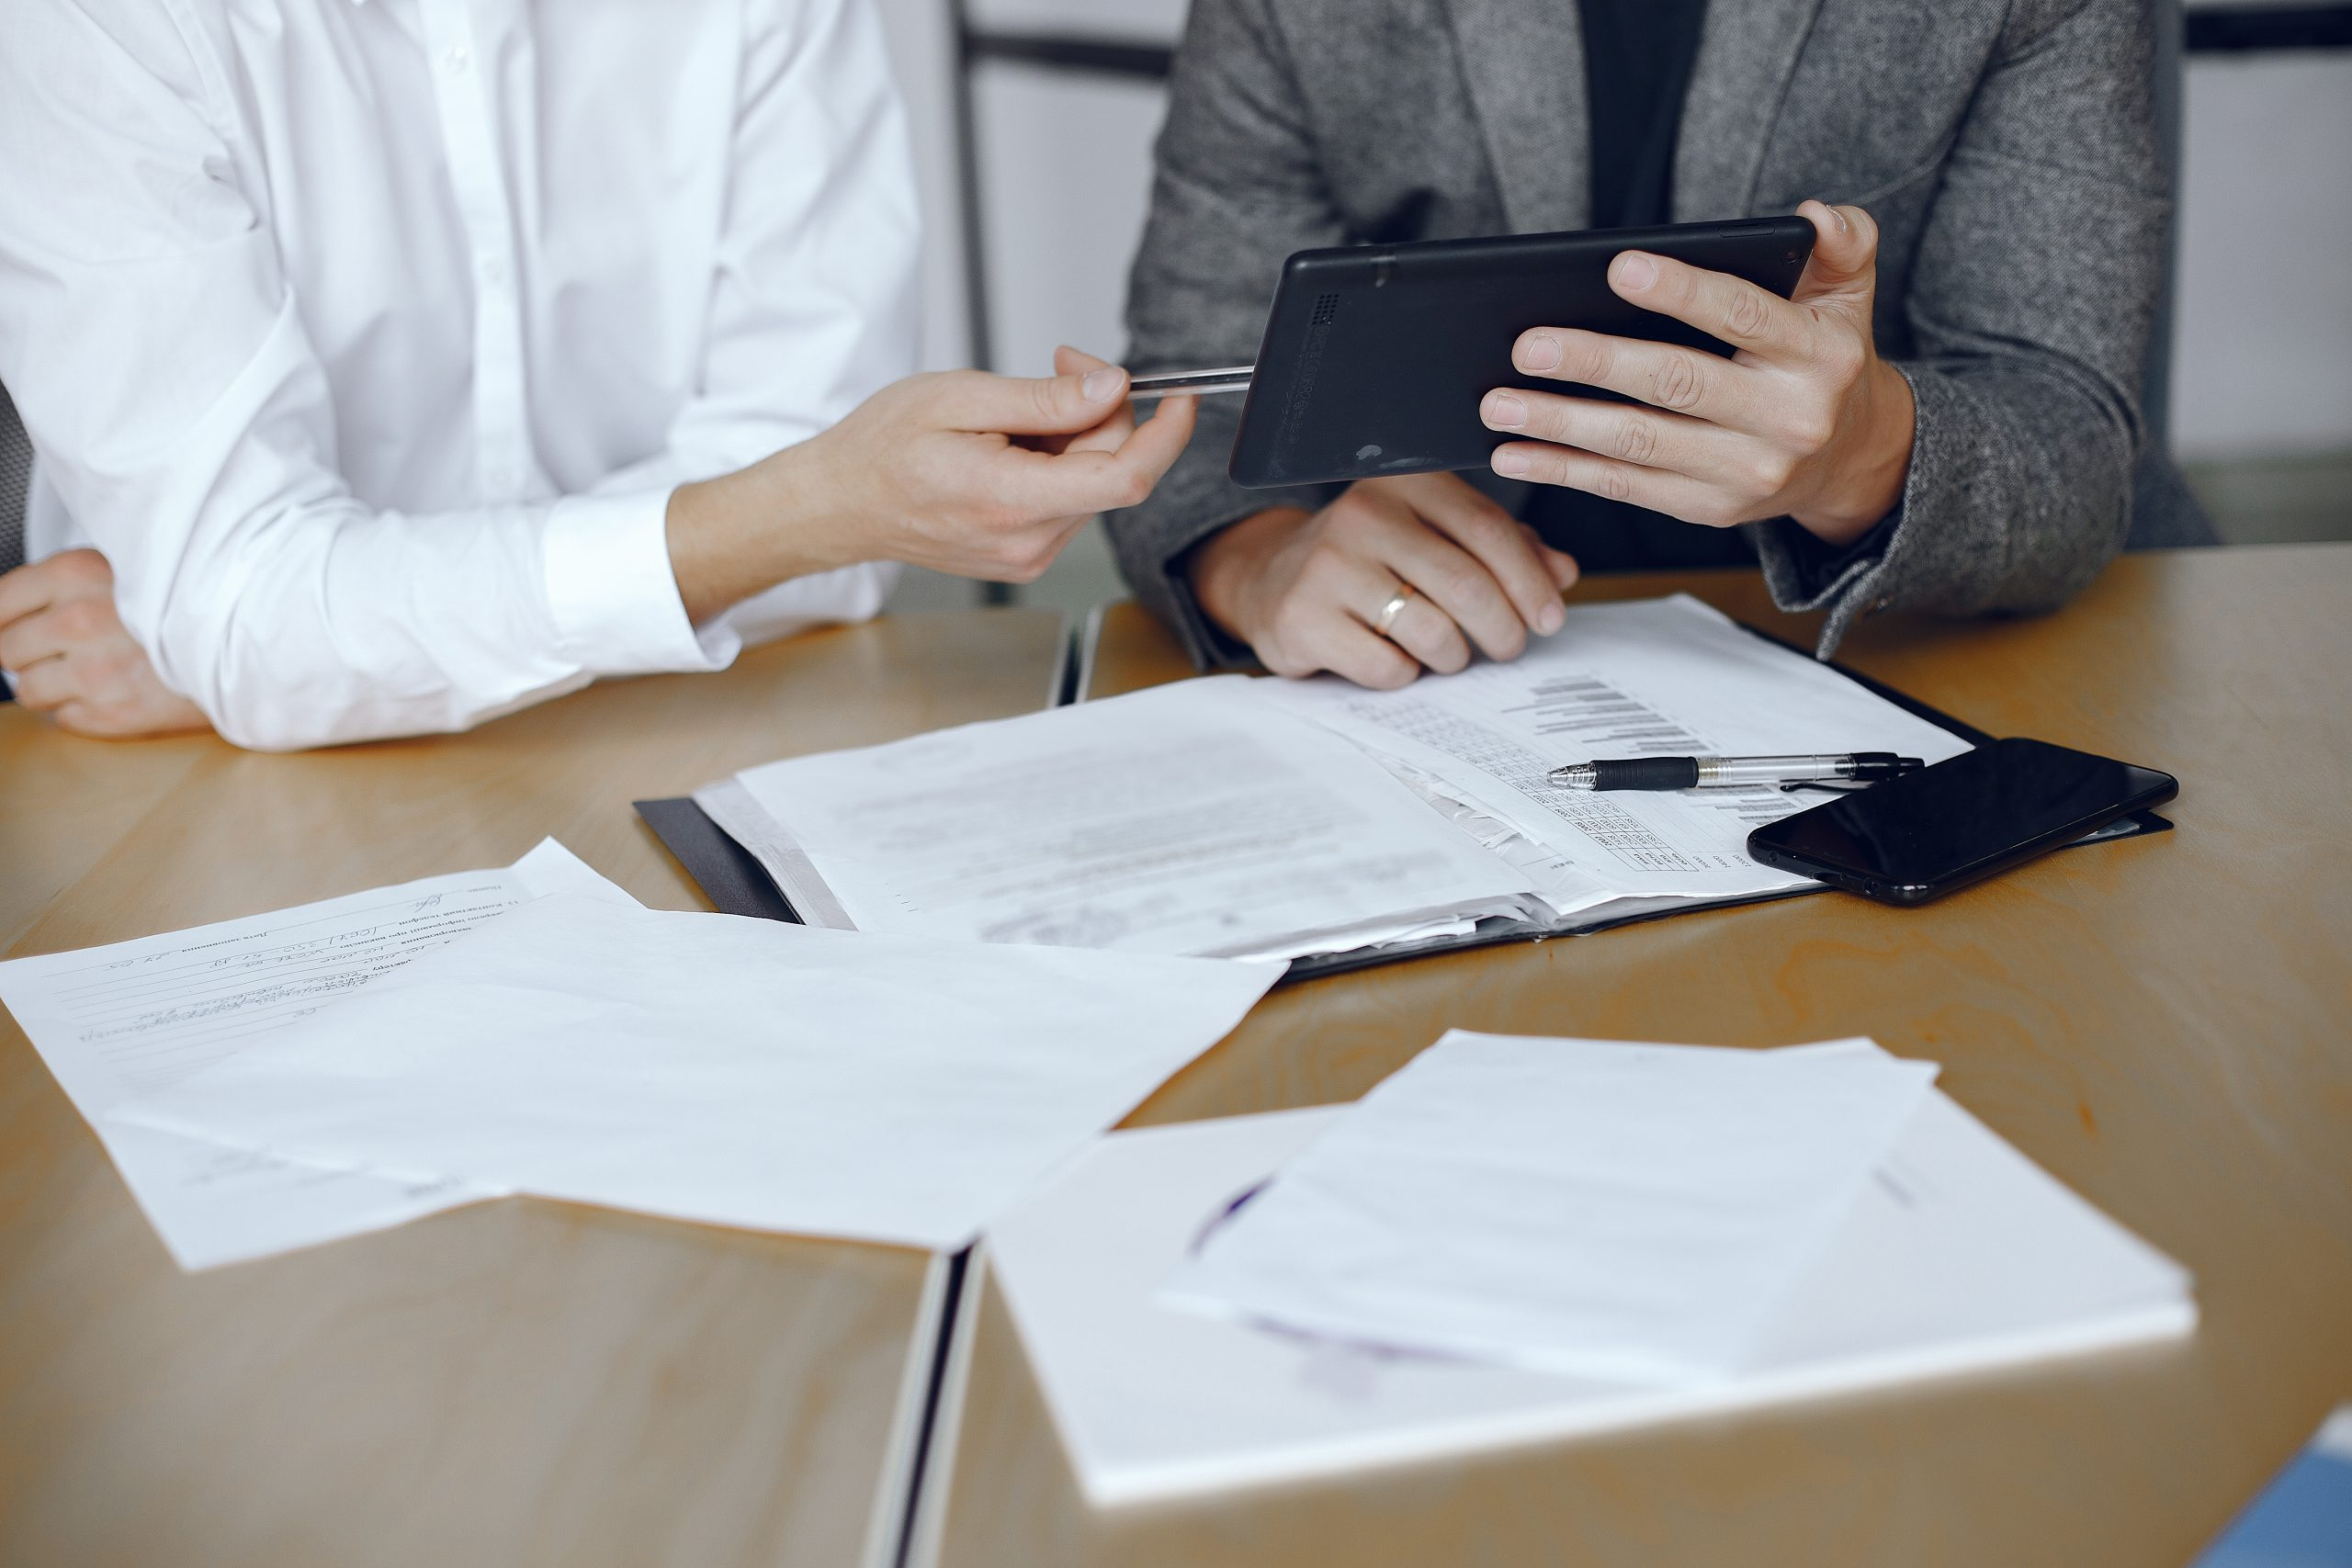 aportación de documentos legales